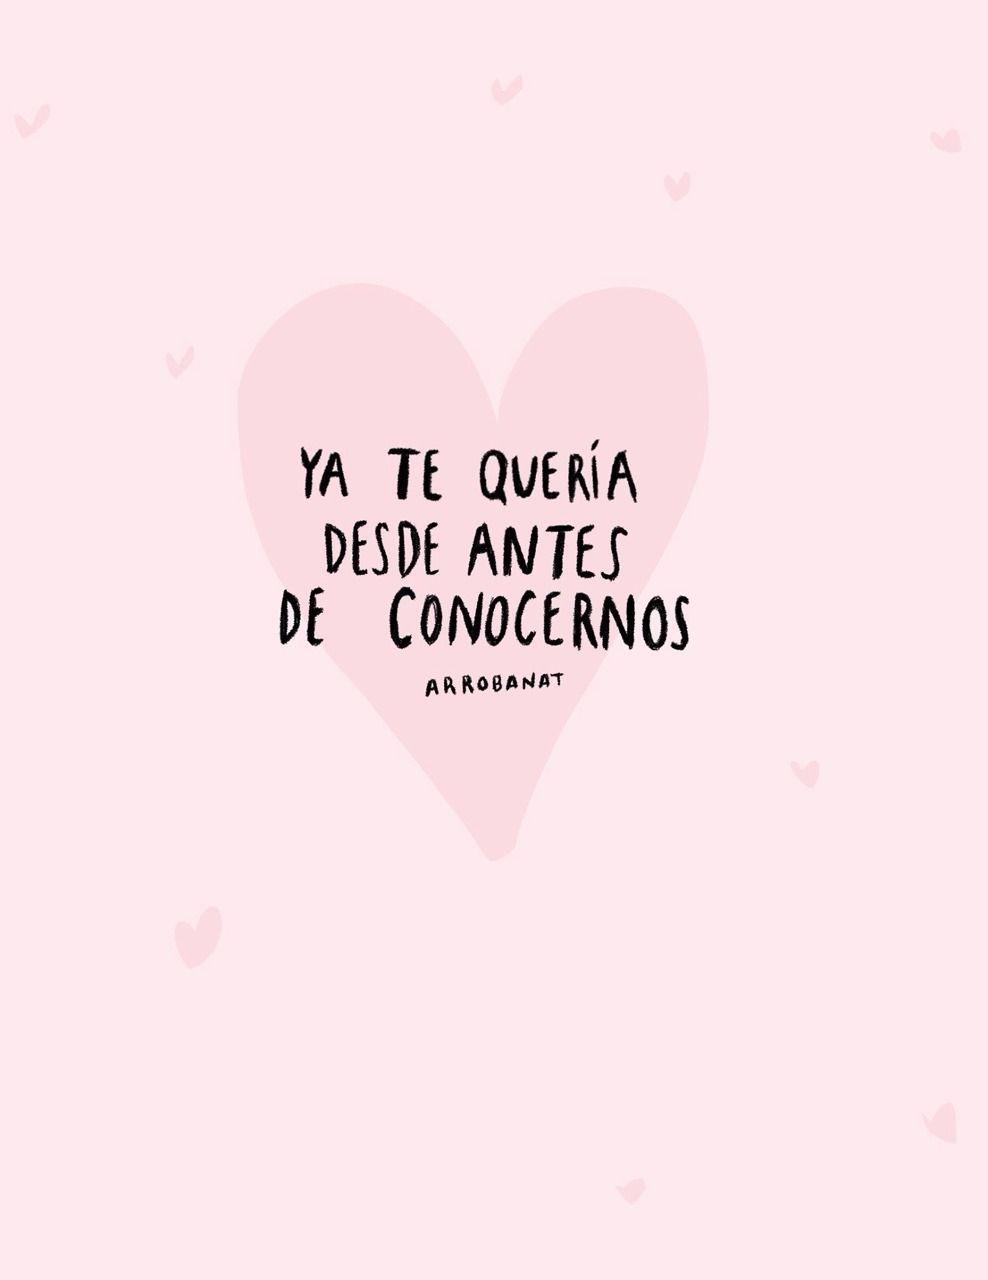 Arroba Nat Frases De Amor Frases De Amor Propio Y Frases